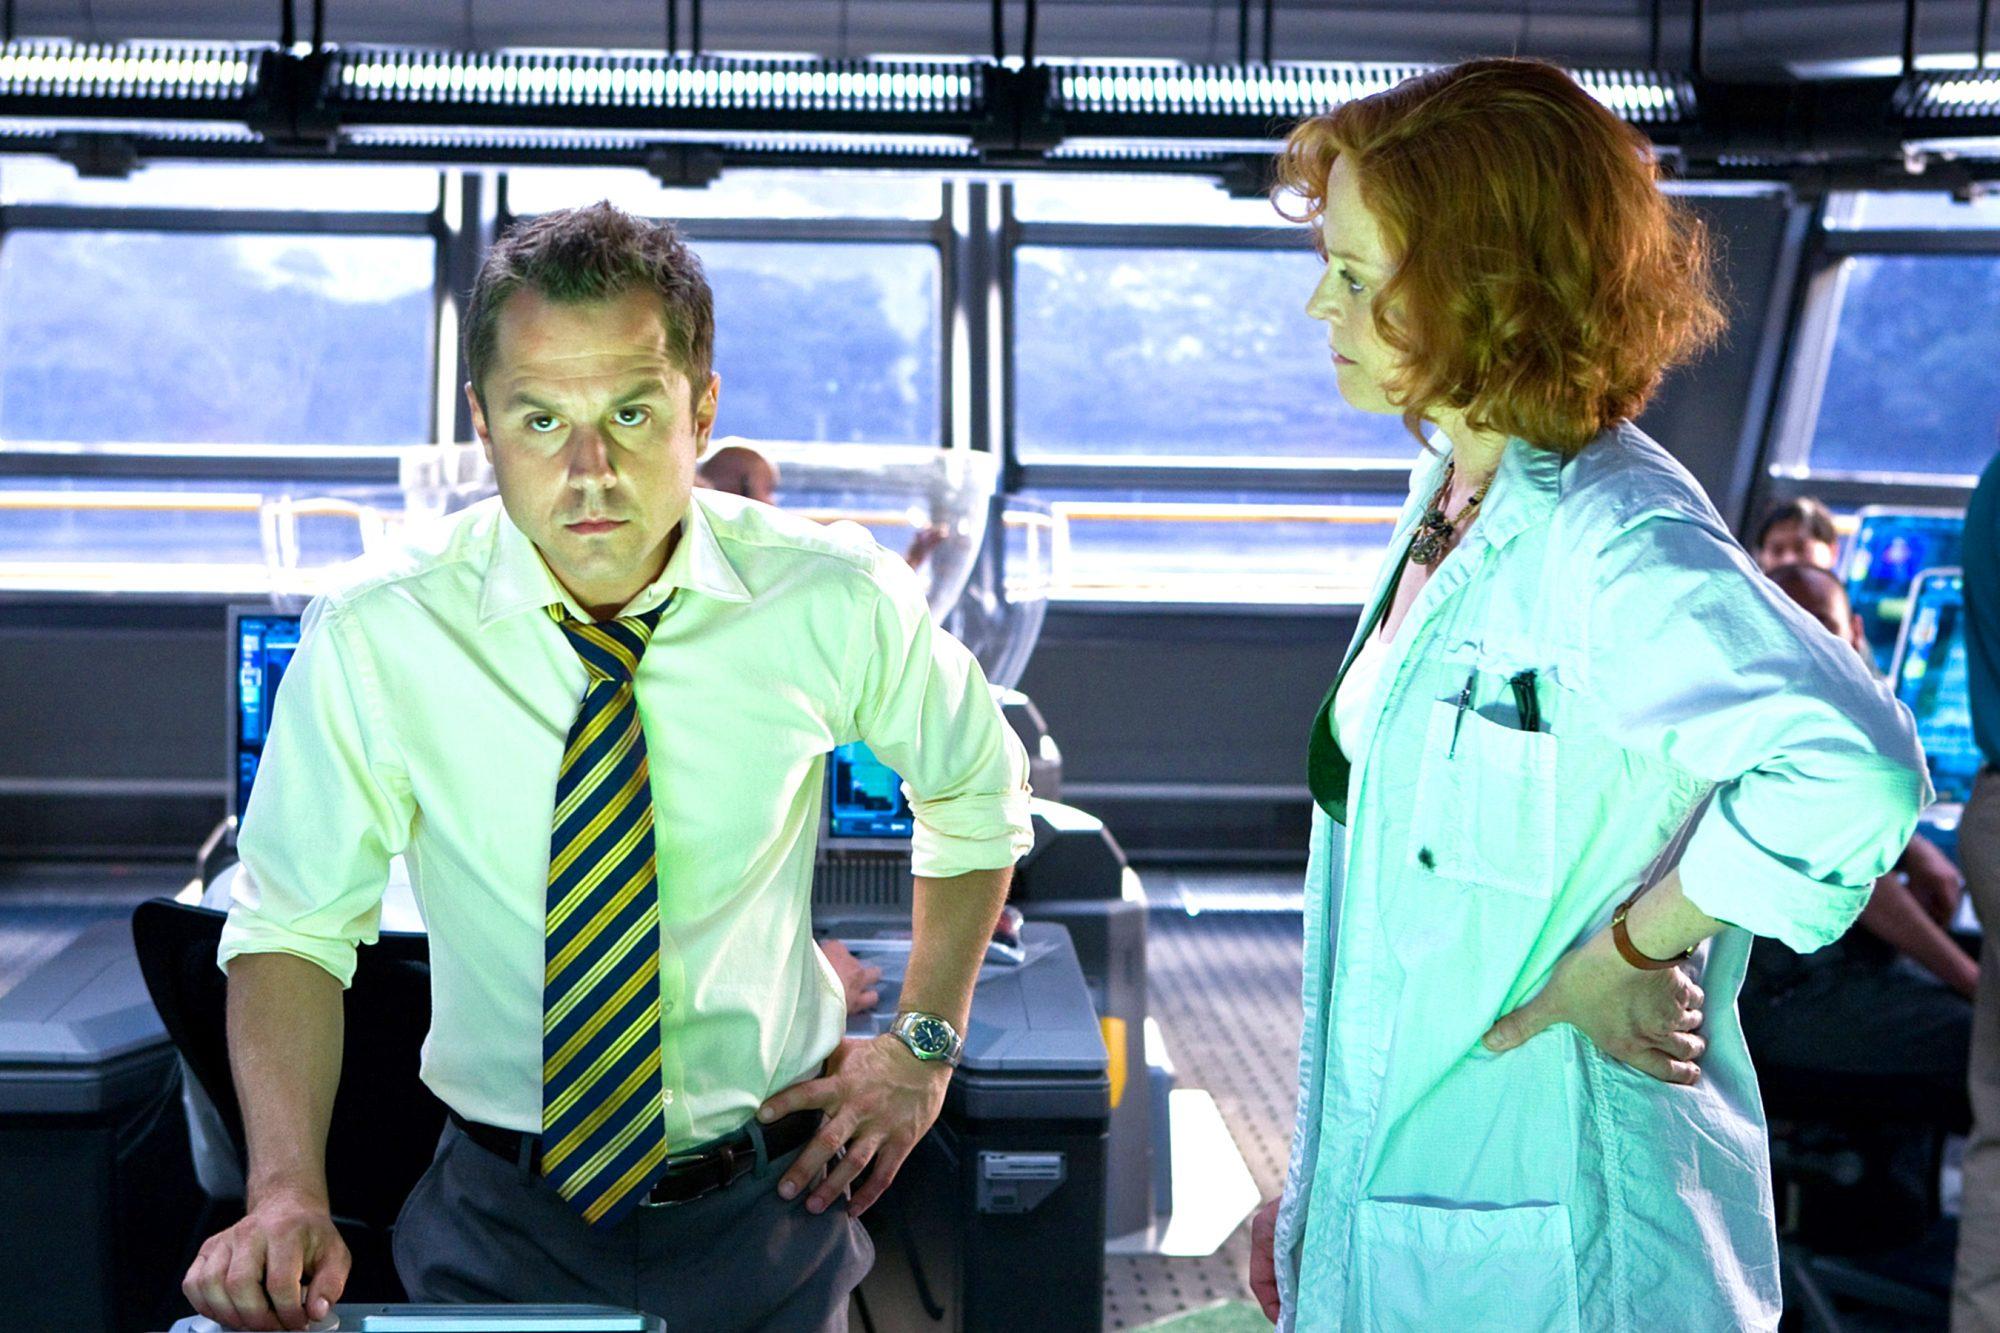 AVATAR, from left: Giovanni Ribisi, Sigourney Weaver, 2009, Ph: Mark Fellman/TM & Copyright ©20th Ce